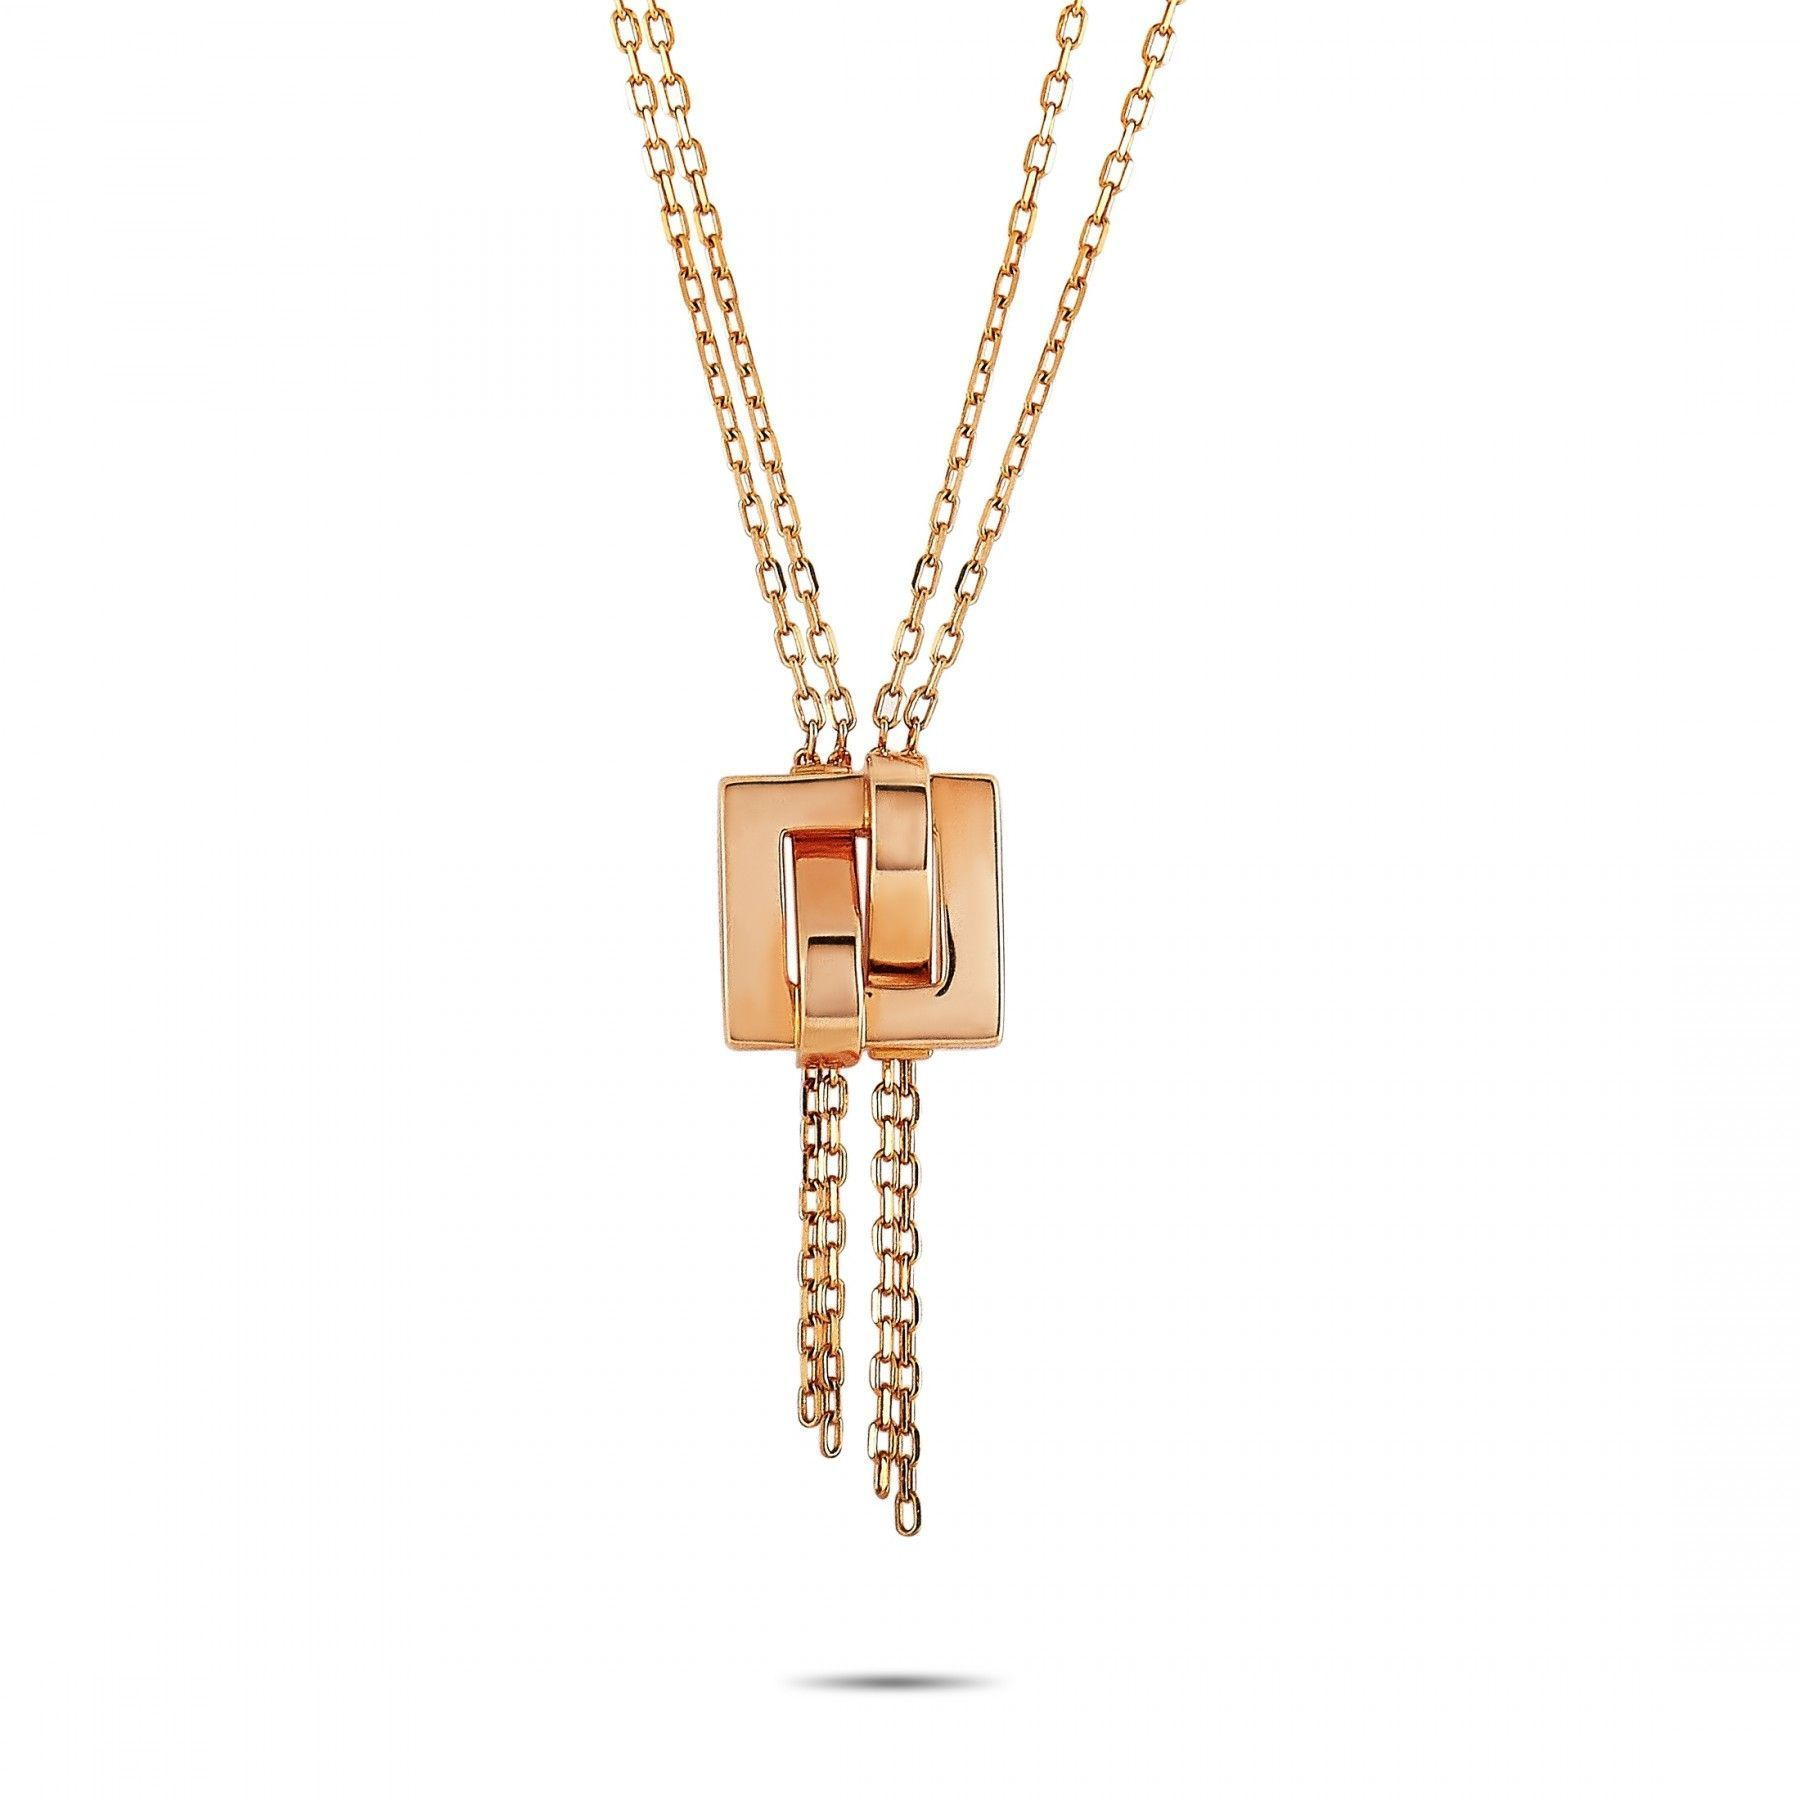 Boucheron 18K Rose Gold Pendant Necklace | Luxury Bazaar | www.luxurybazaar.com